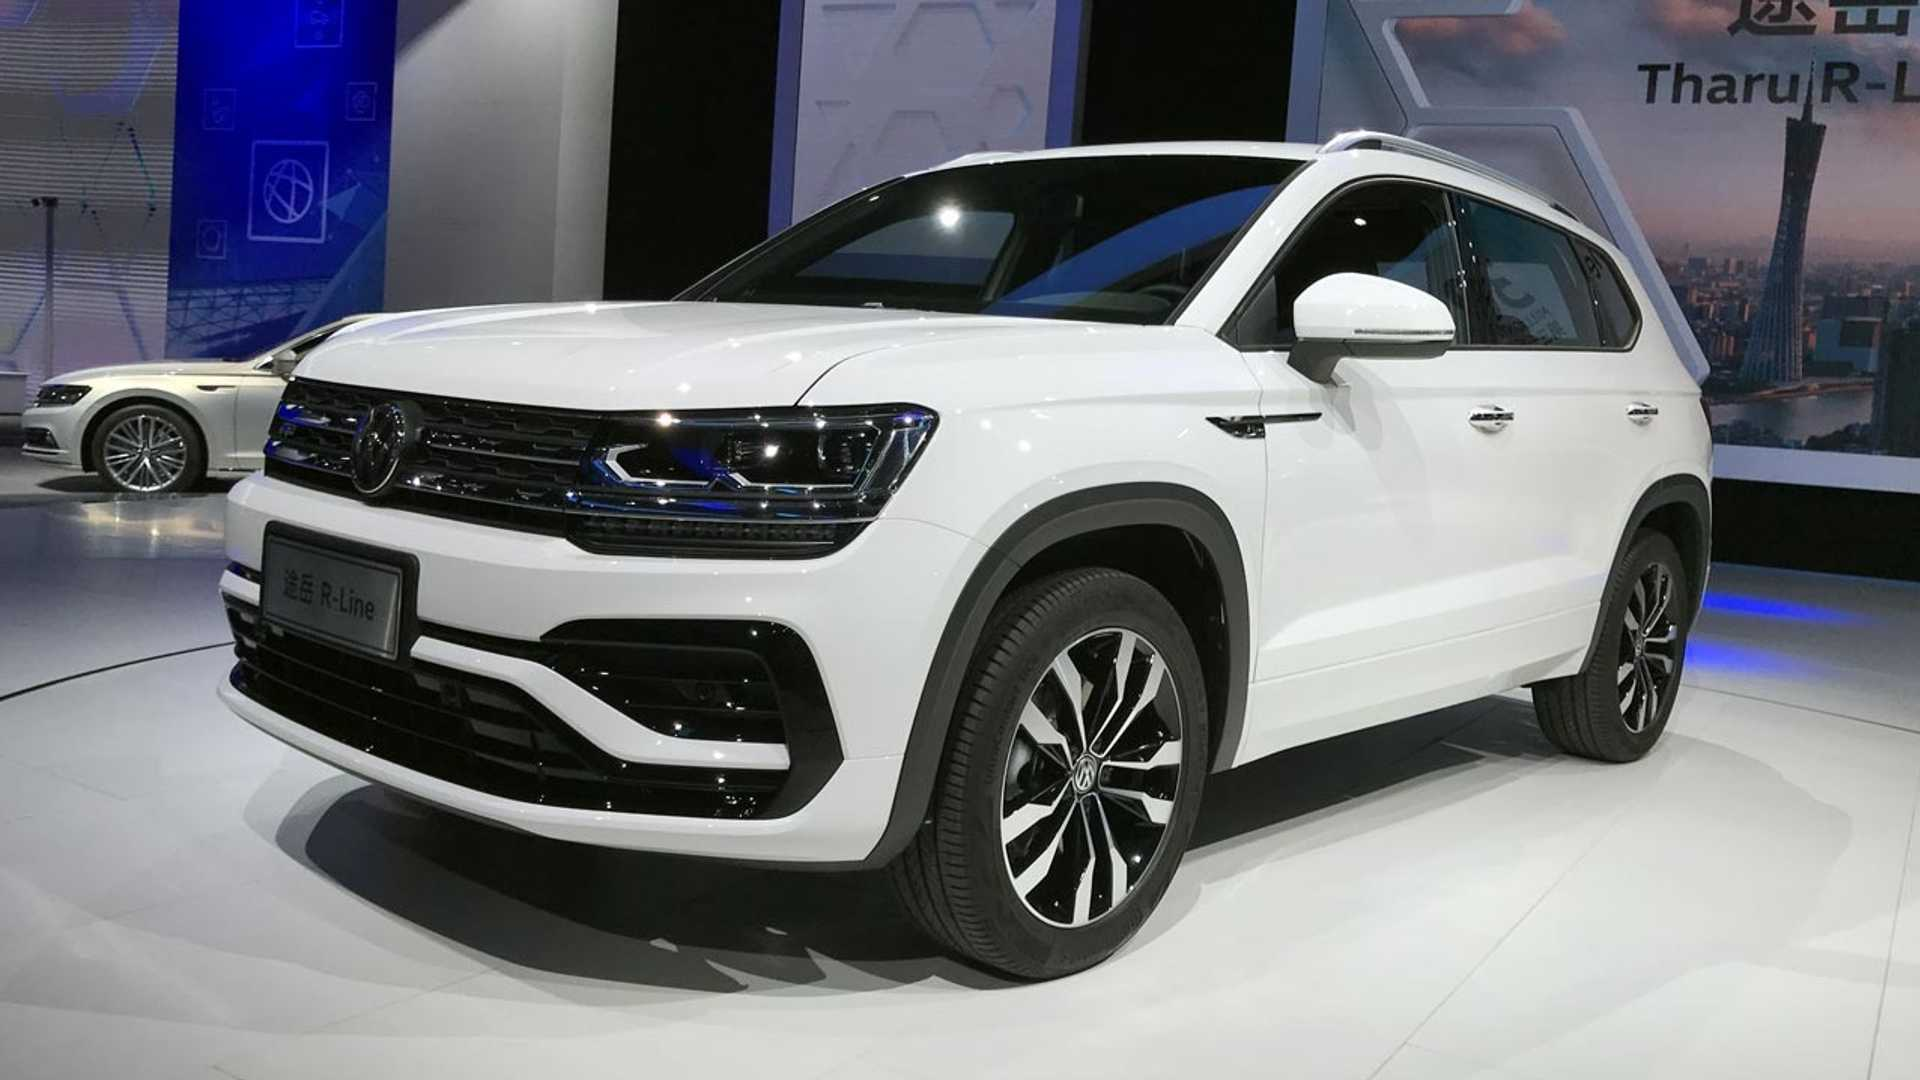 Forum gratis : Compra e venda engenharia Carro Volkswagen-tarek-salao-de-guangzhou-china